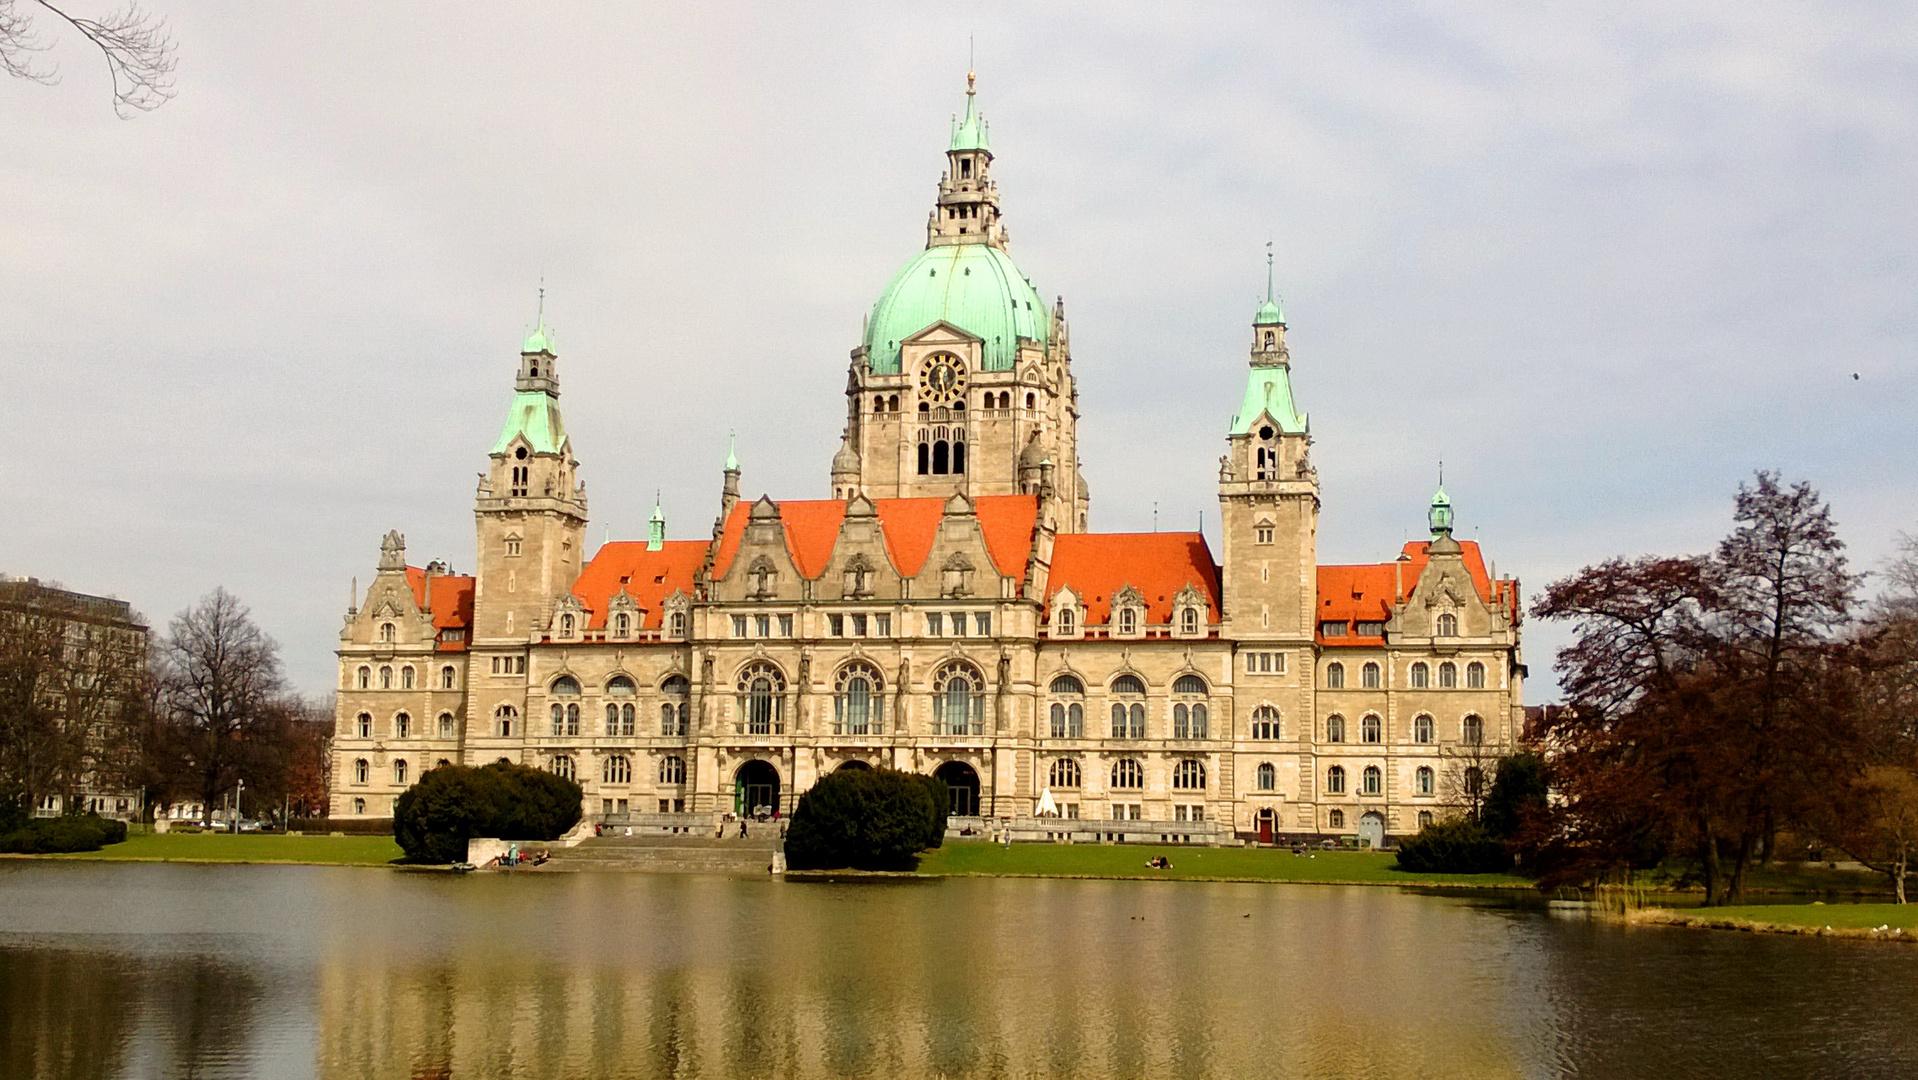 Neues Rathaus Hannover zu Beginn des Frühlings